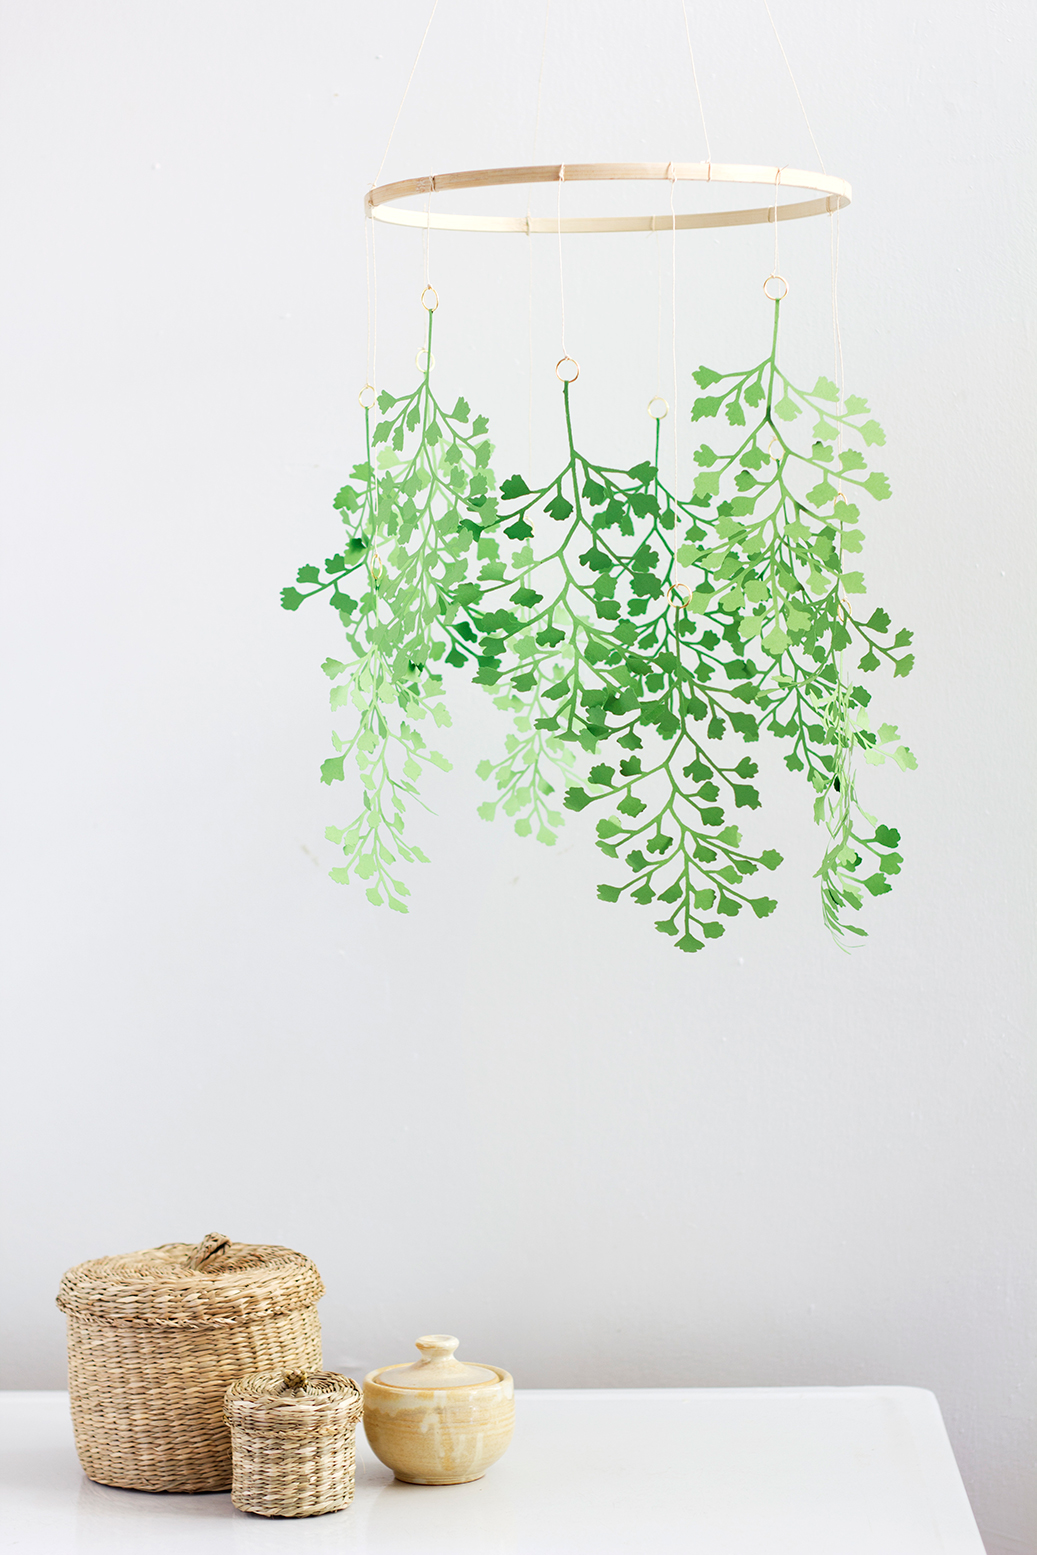 DIY paper maidenhair fern mobile